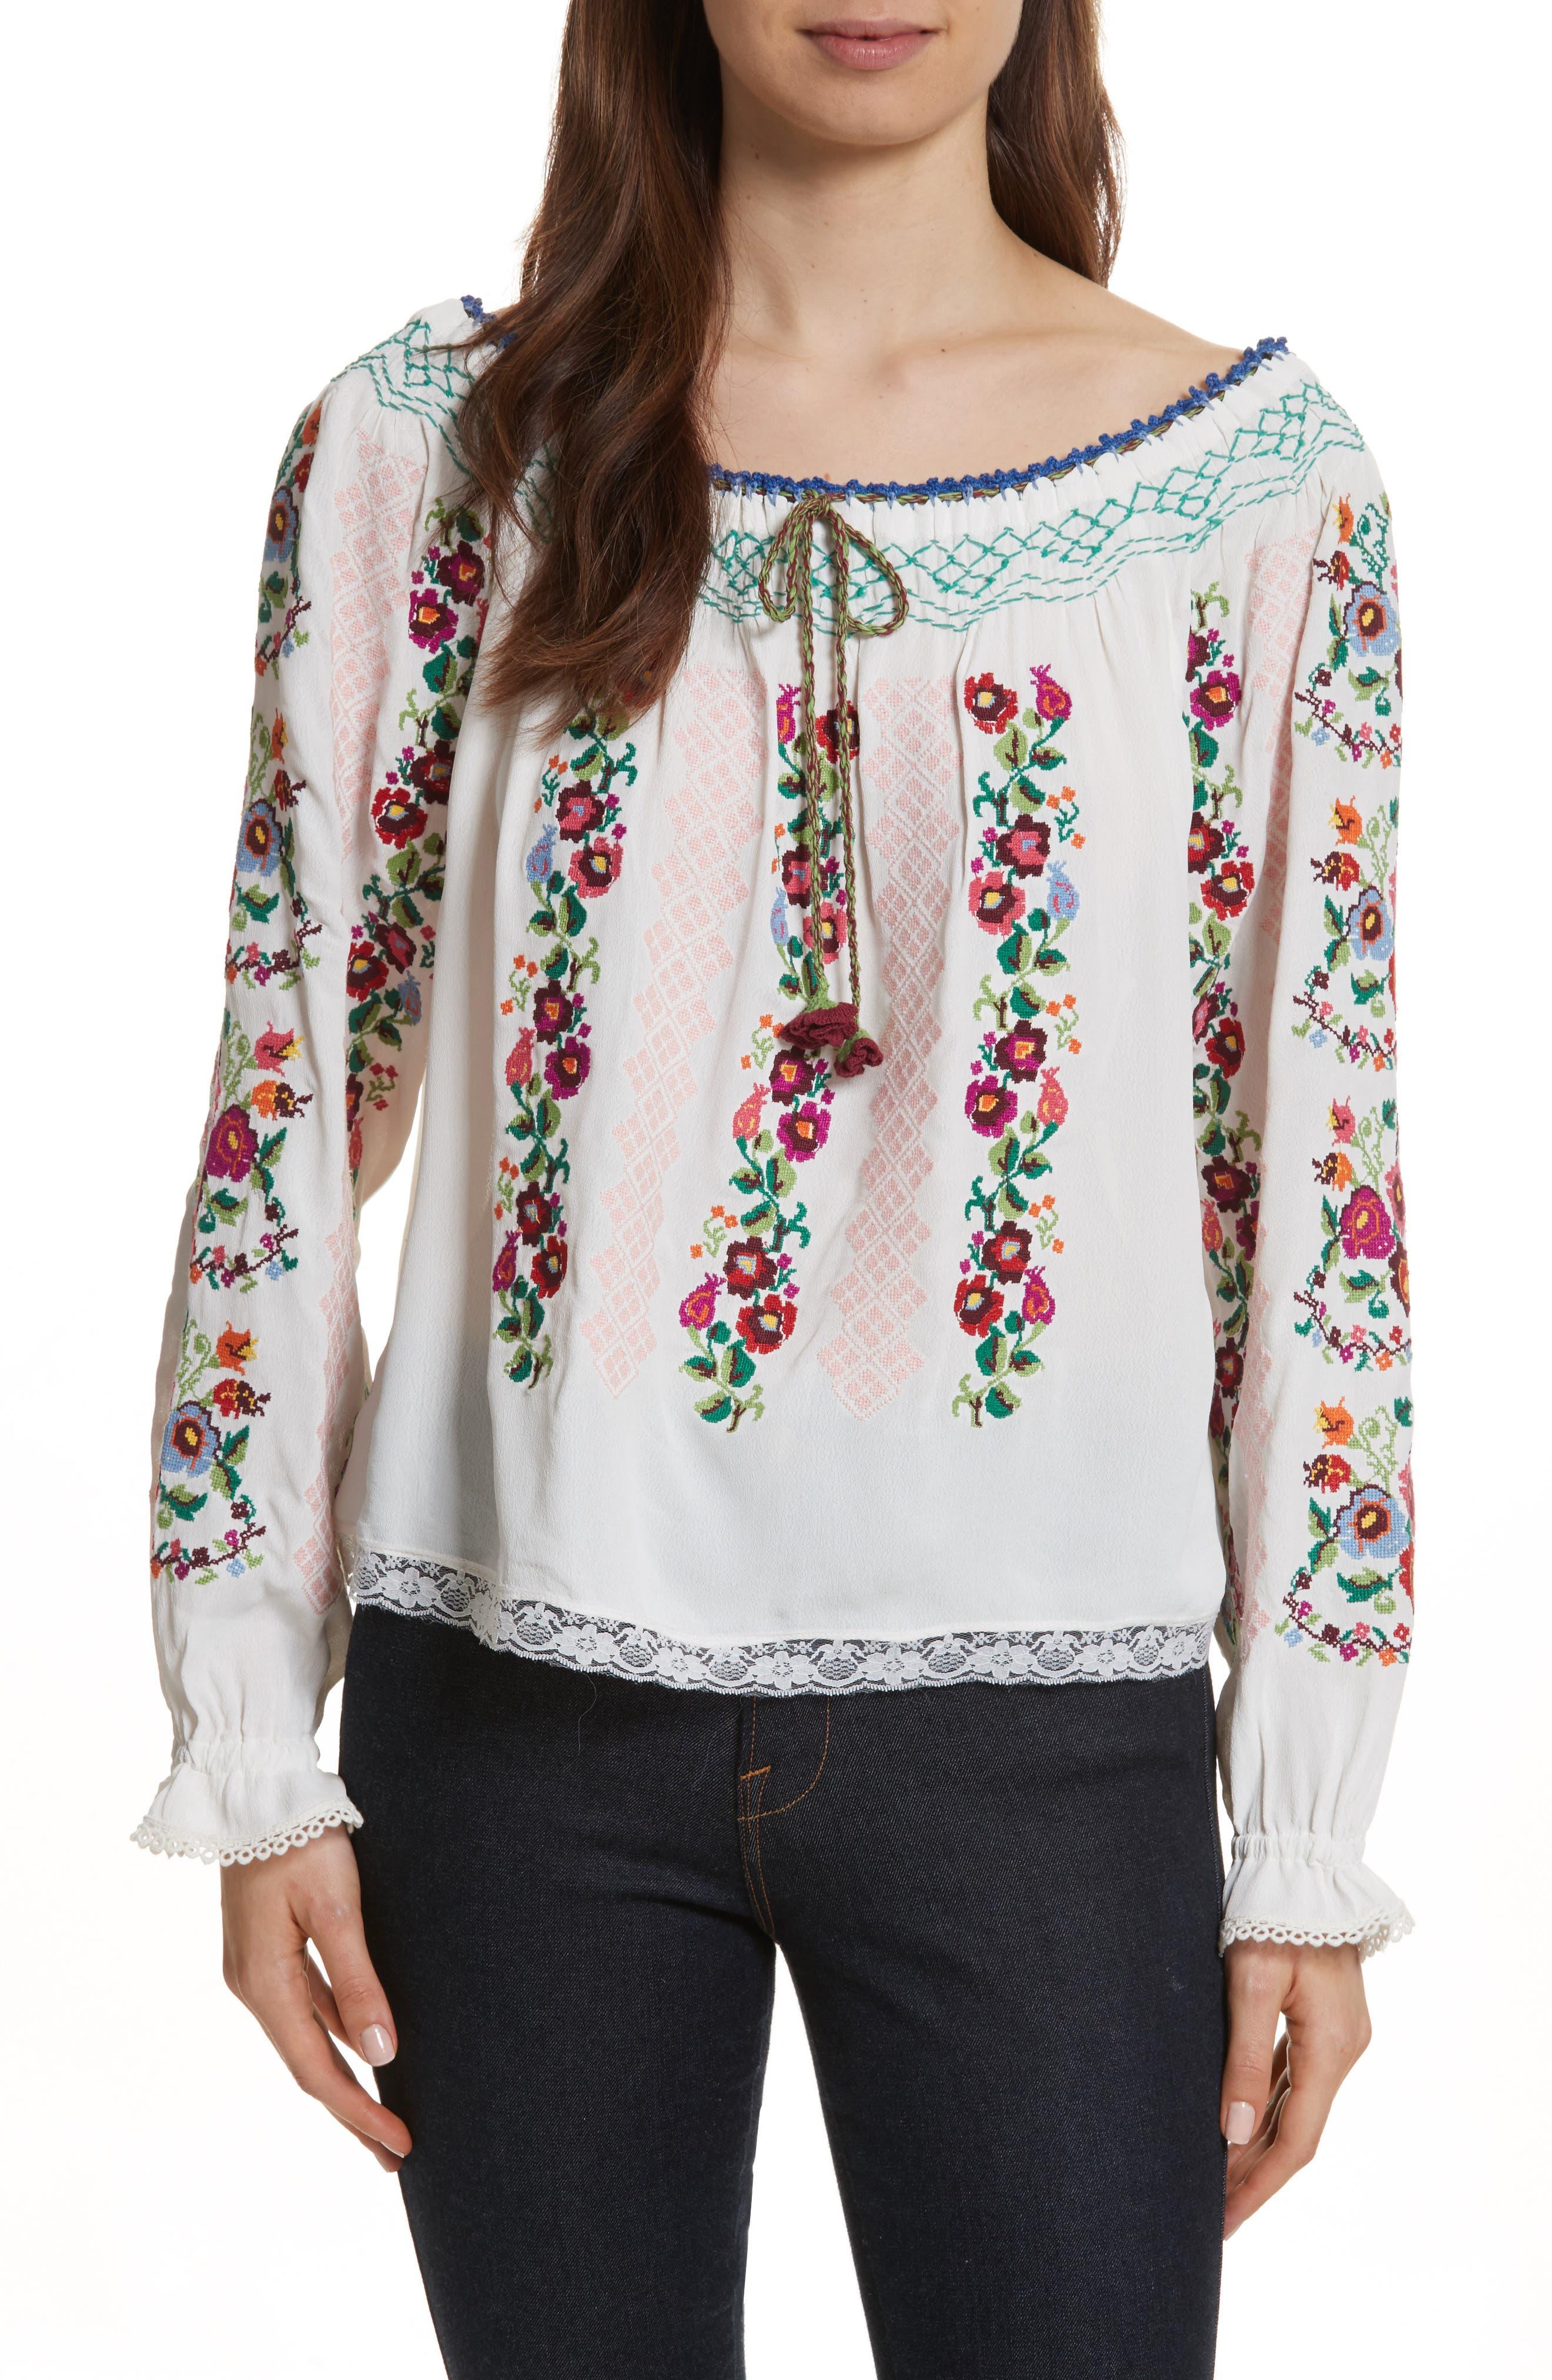 Needle & Thread Cross Stitch Floral Top